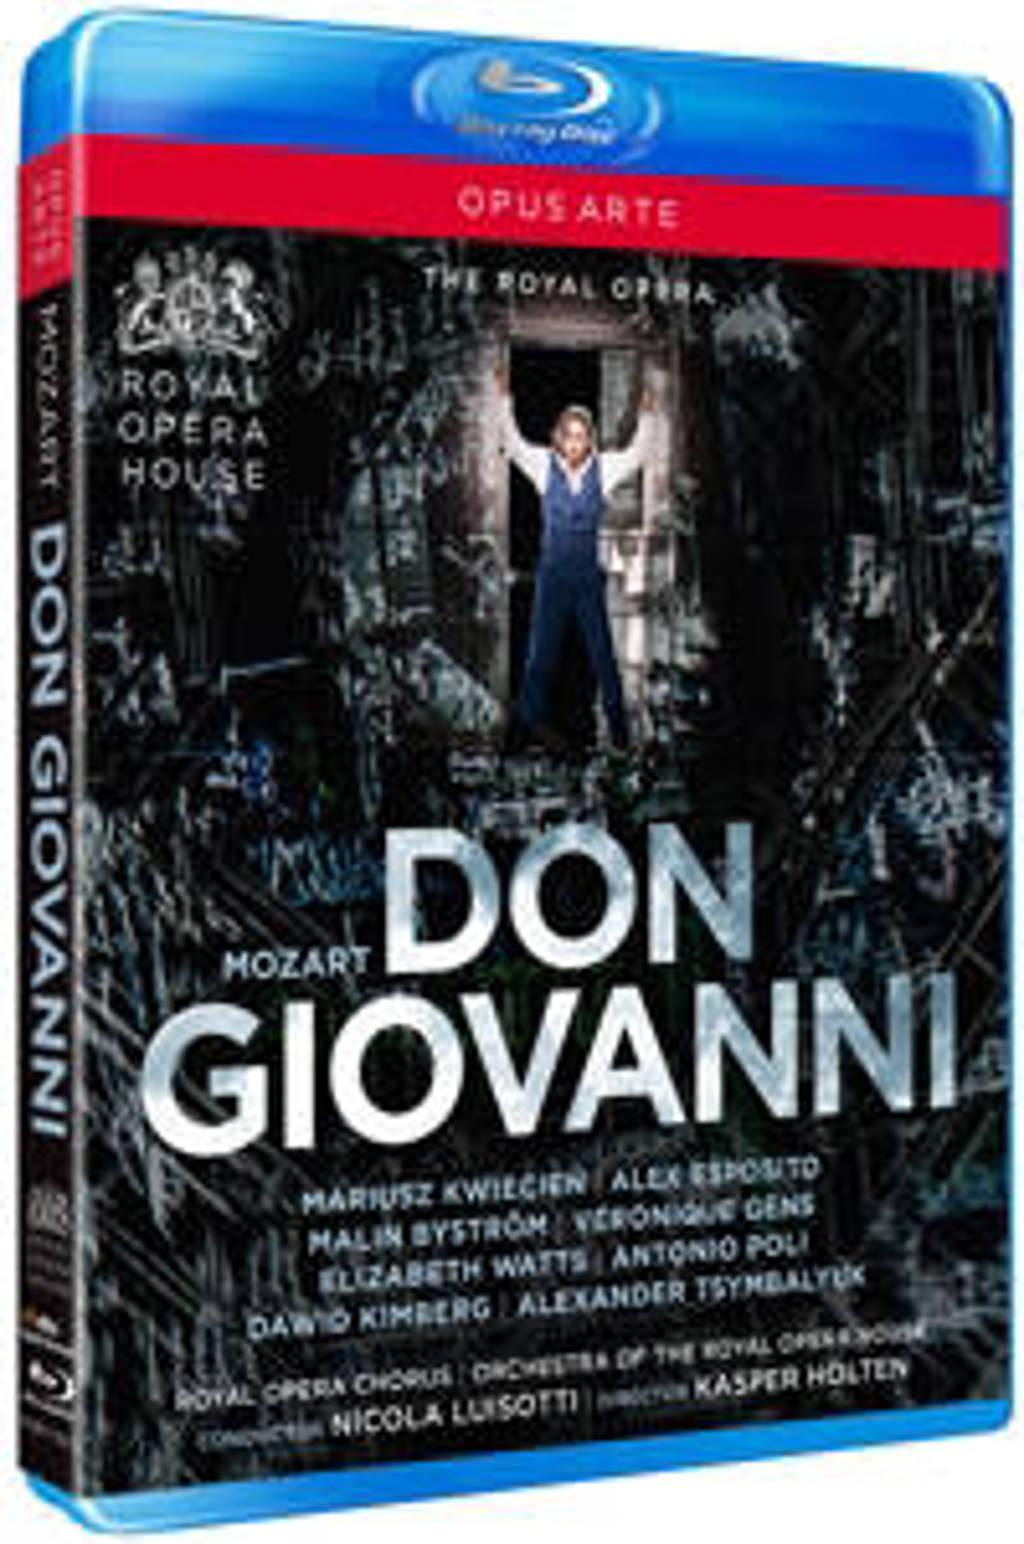 Royal Opera House - Don Giovanni (Blu-ray)